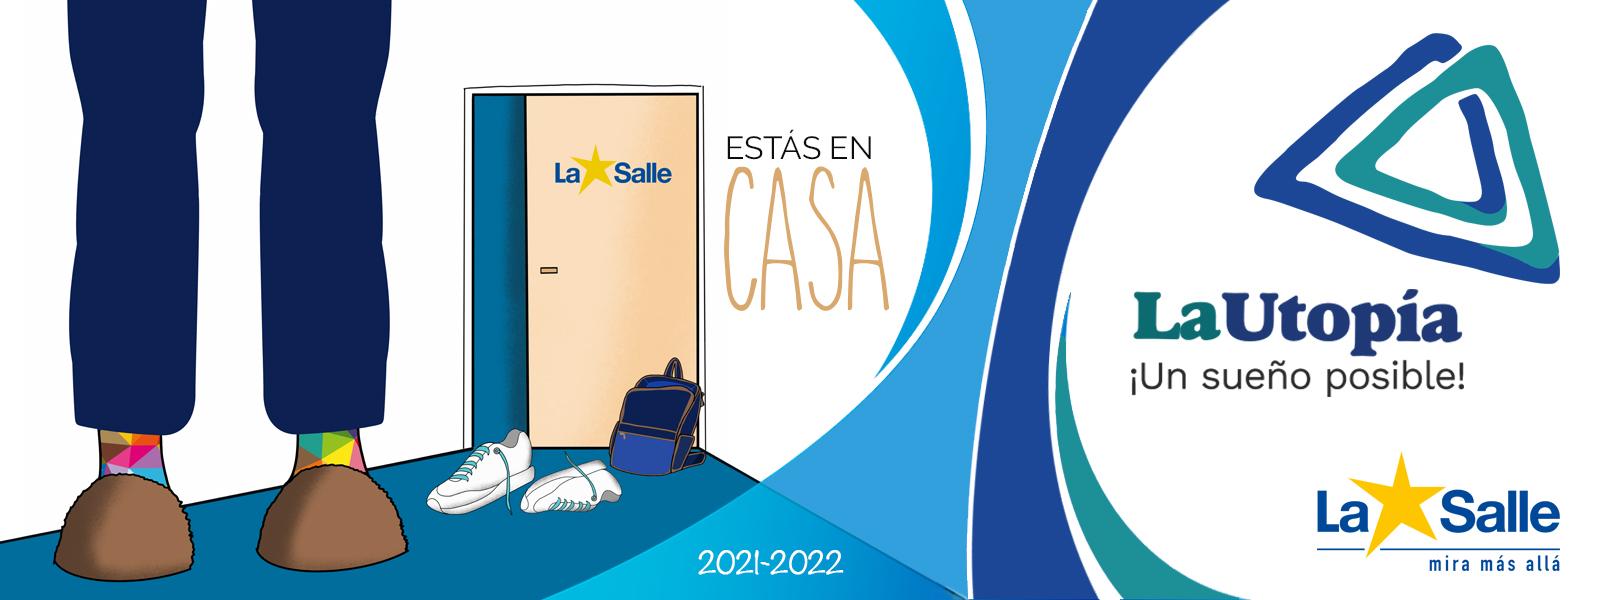 Banner 2021-2022_RRSS_web(1600x600)_ESP